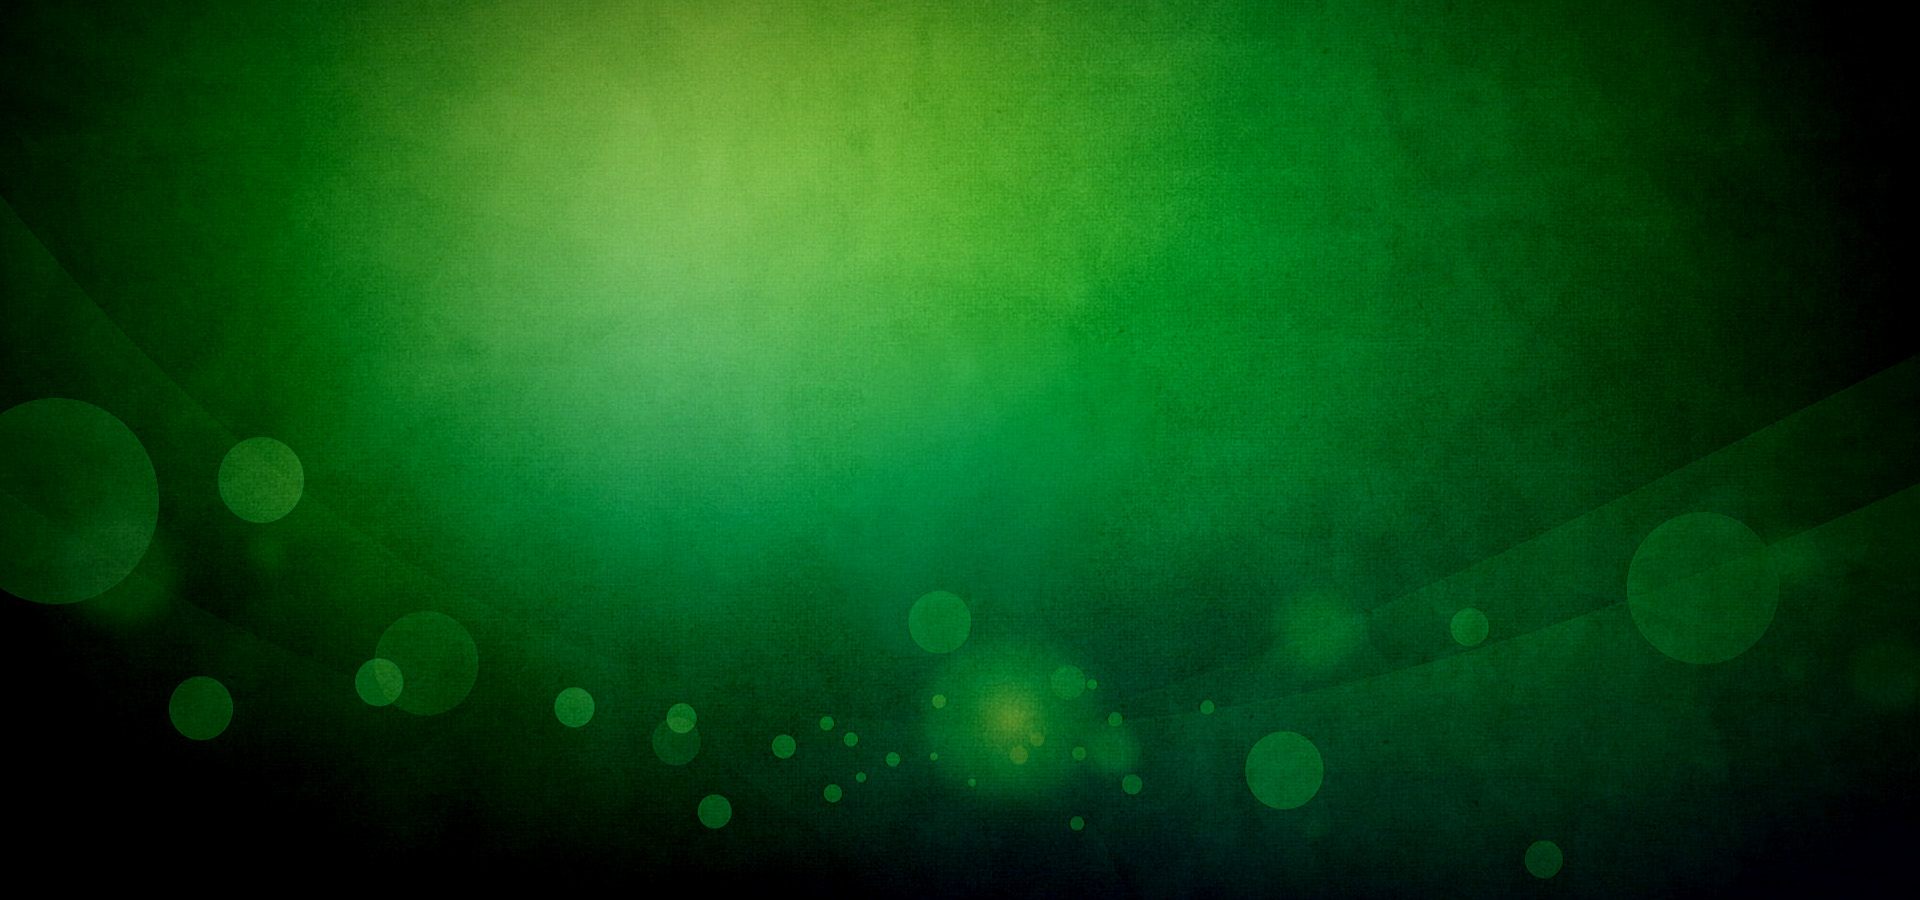 Круг зеленый png